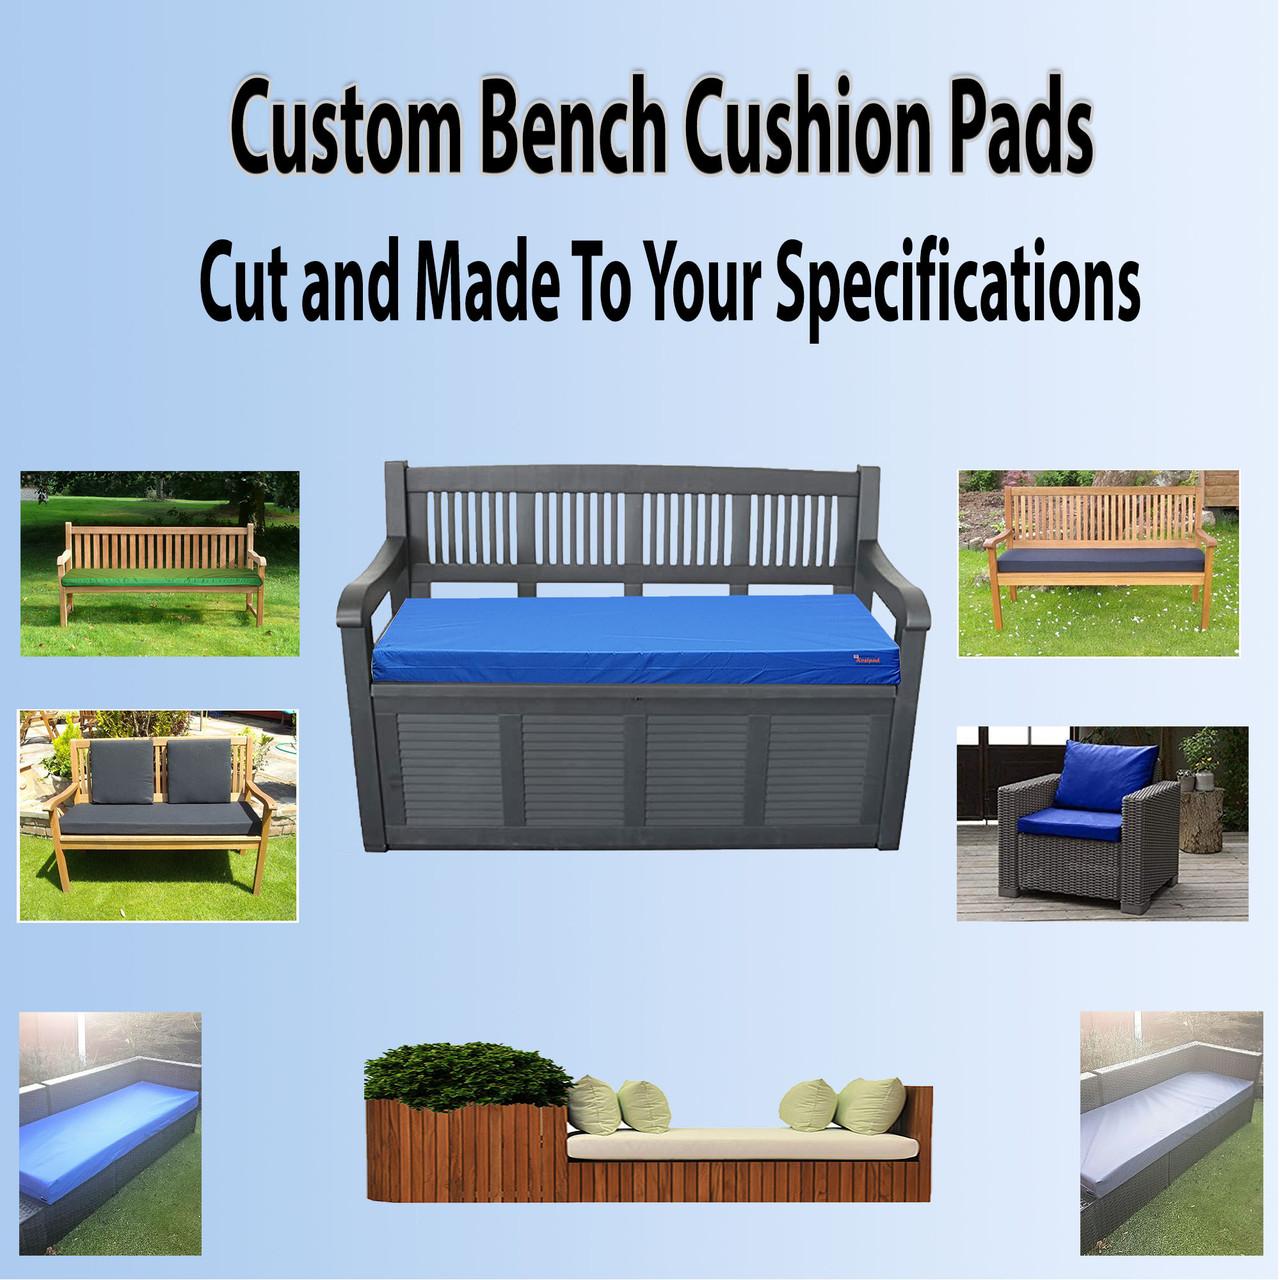 Custom-Bench-cushion-pads-cut-to-size